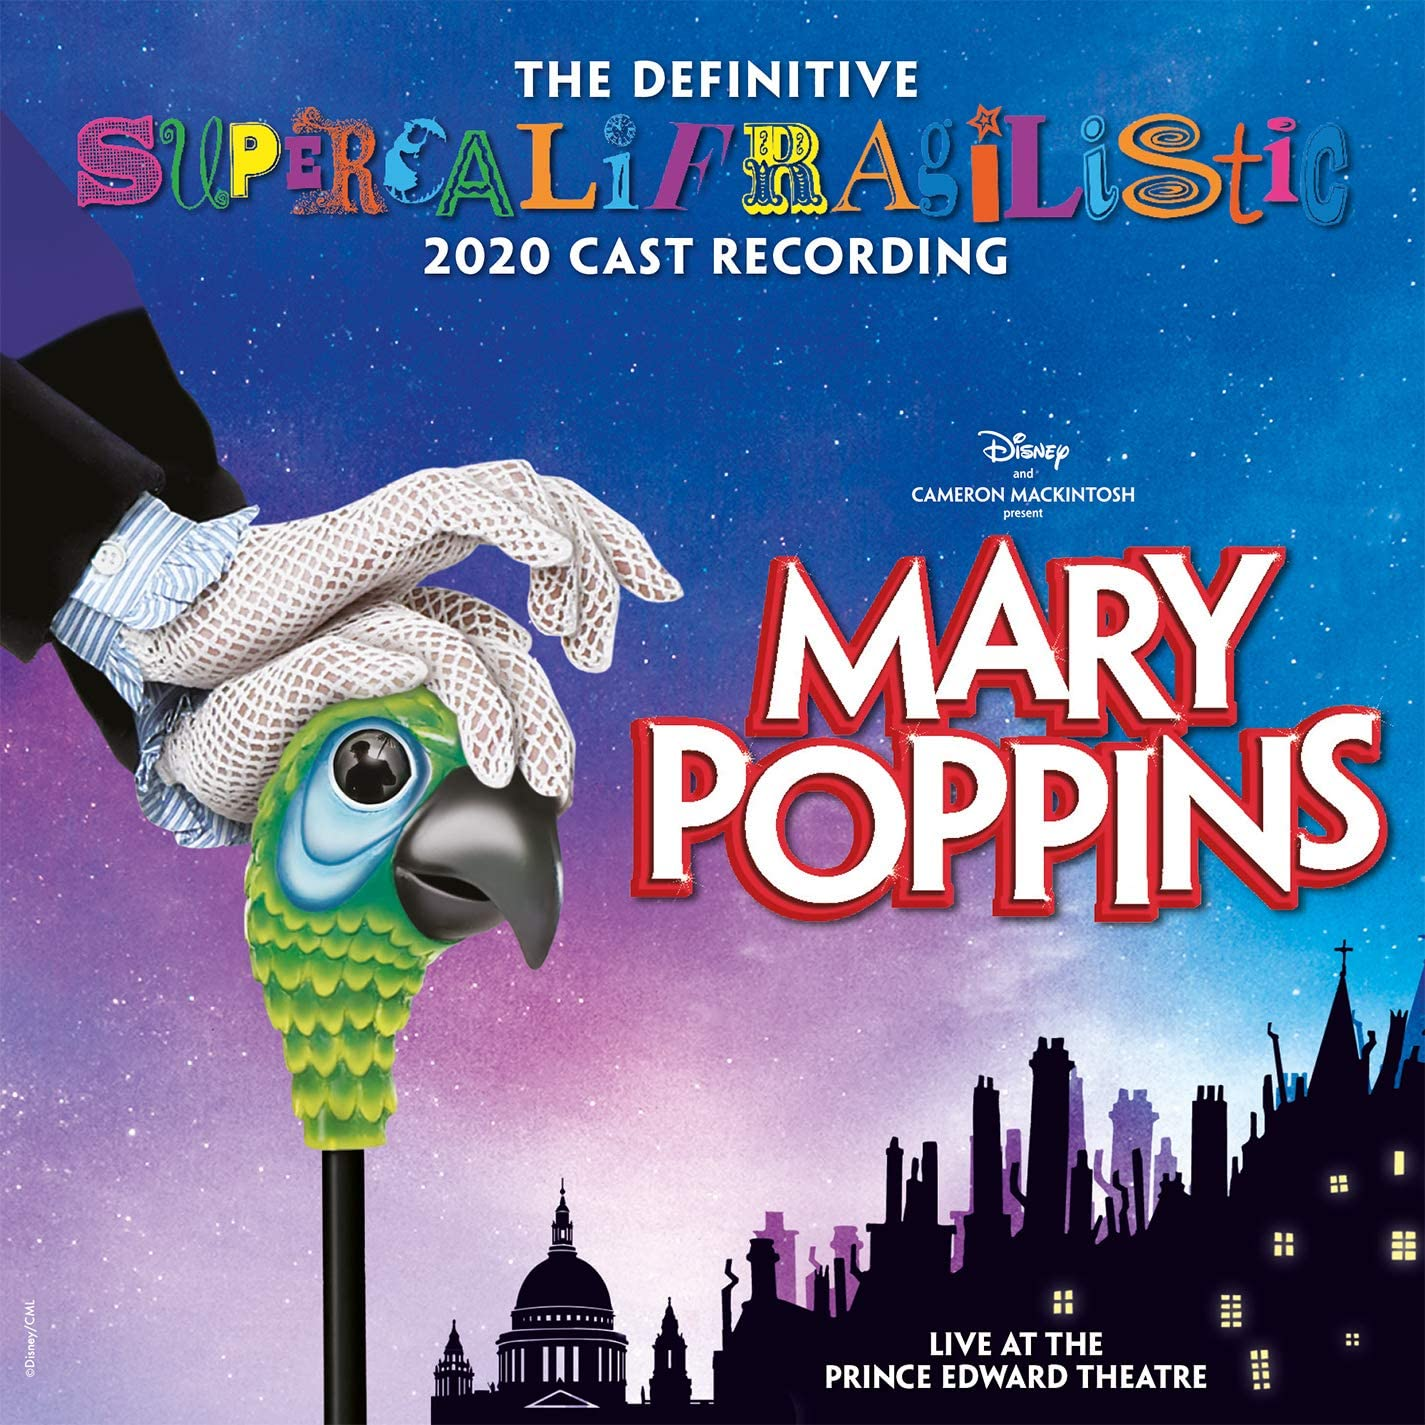 Mary Poppins - 2020 Cast Recording